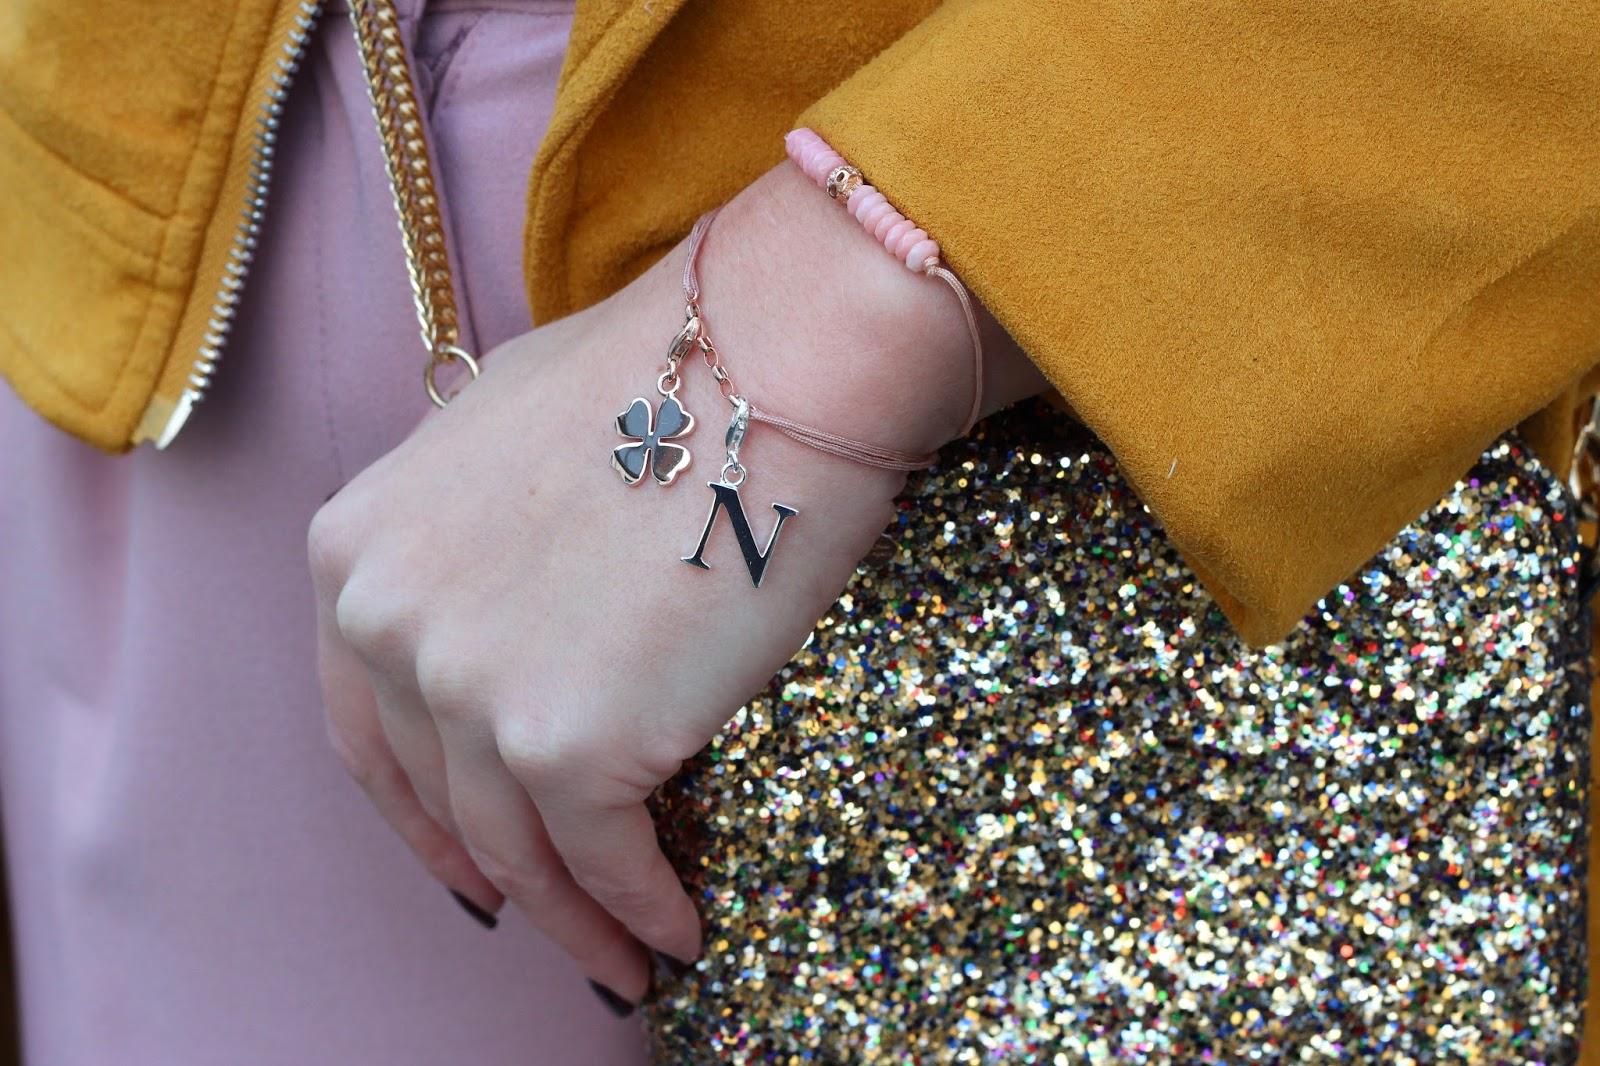 Thomas-Sabo-charm-bracelet